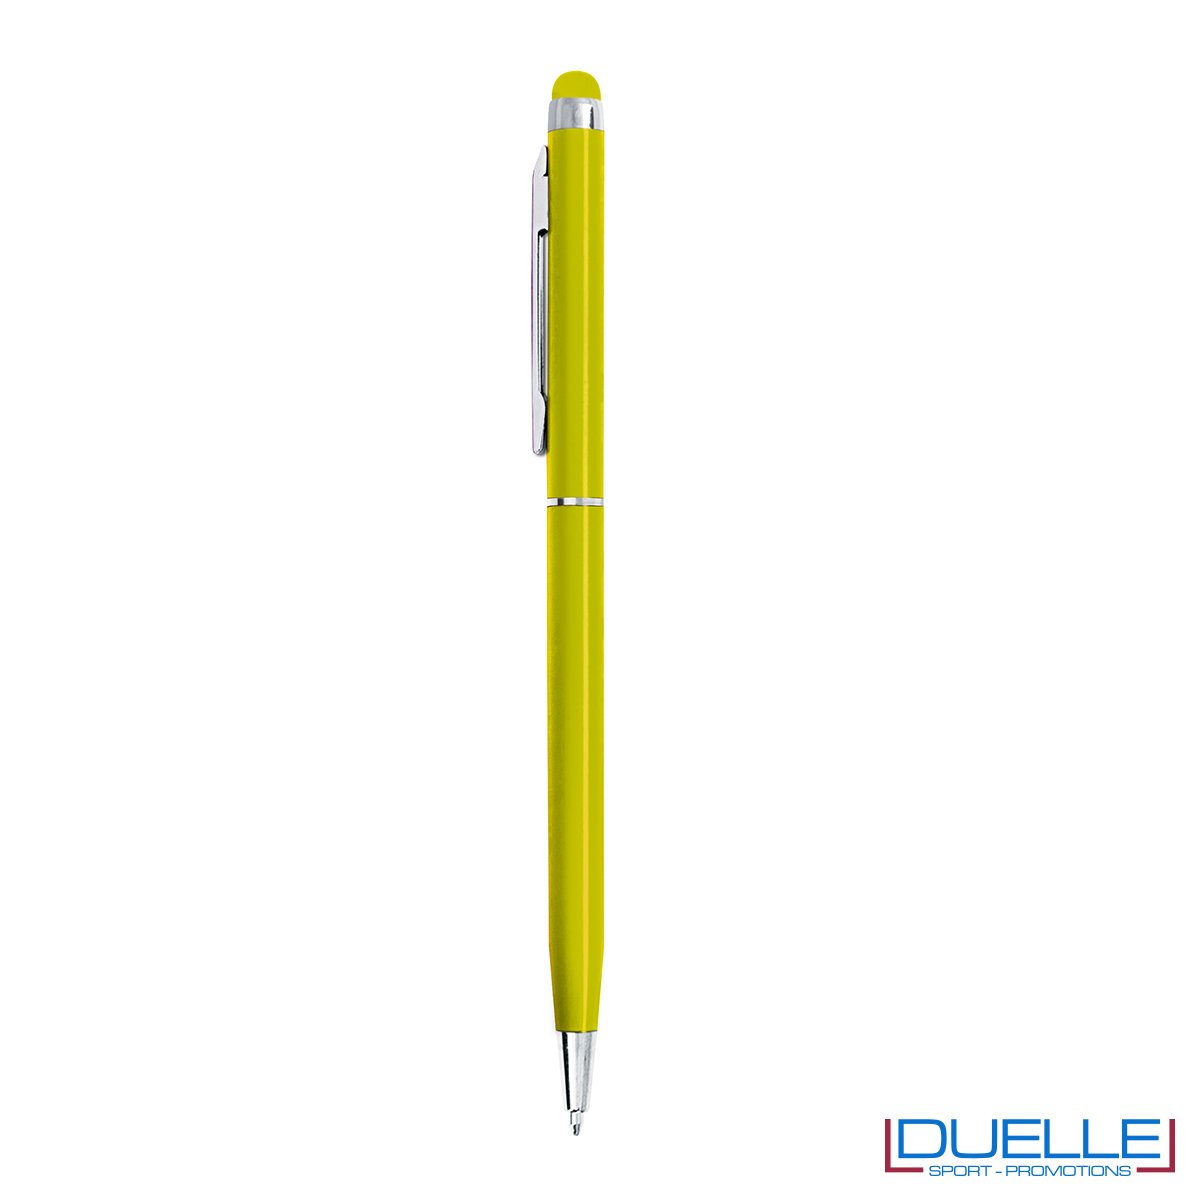 penna touch screen fusto sottile personalizzate in metallo rosse, penne touch personalizzata colore verde lime